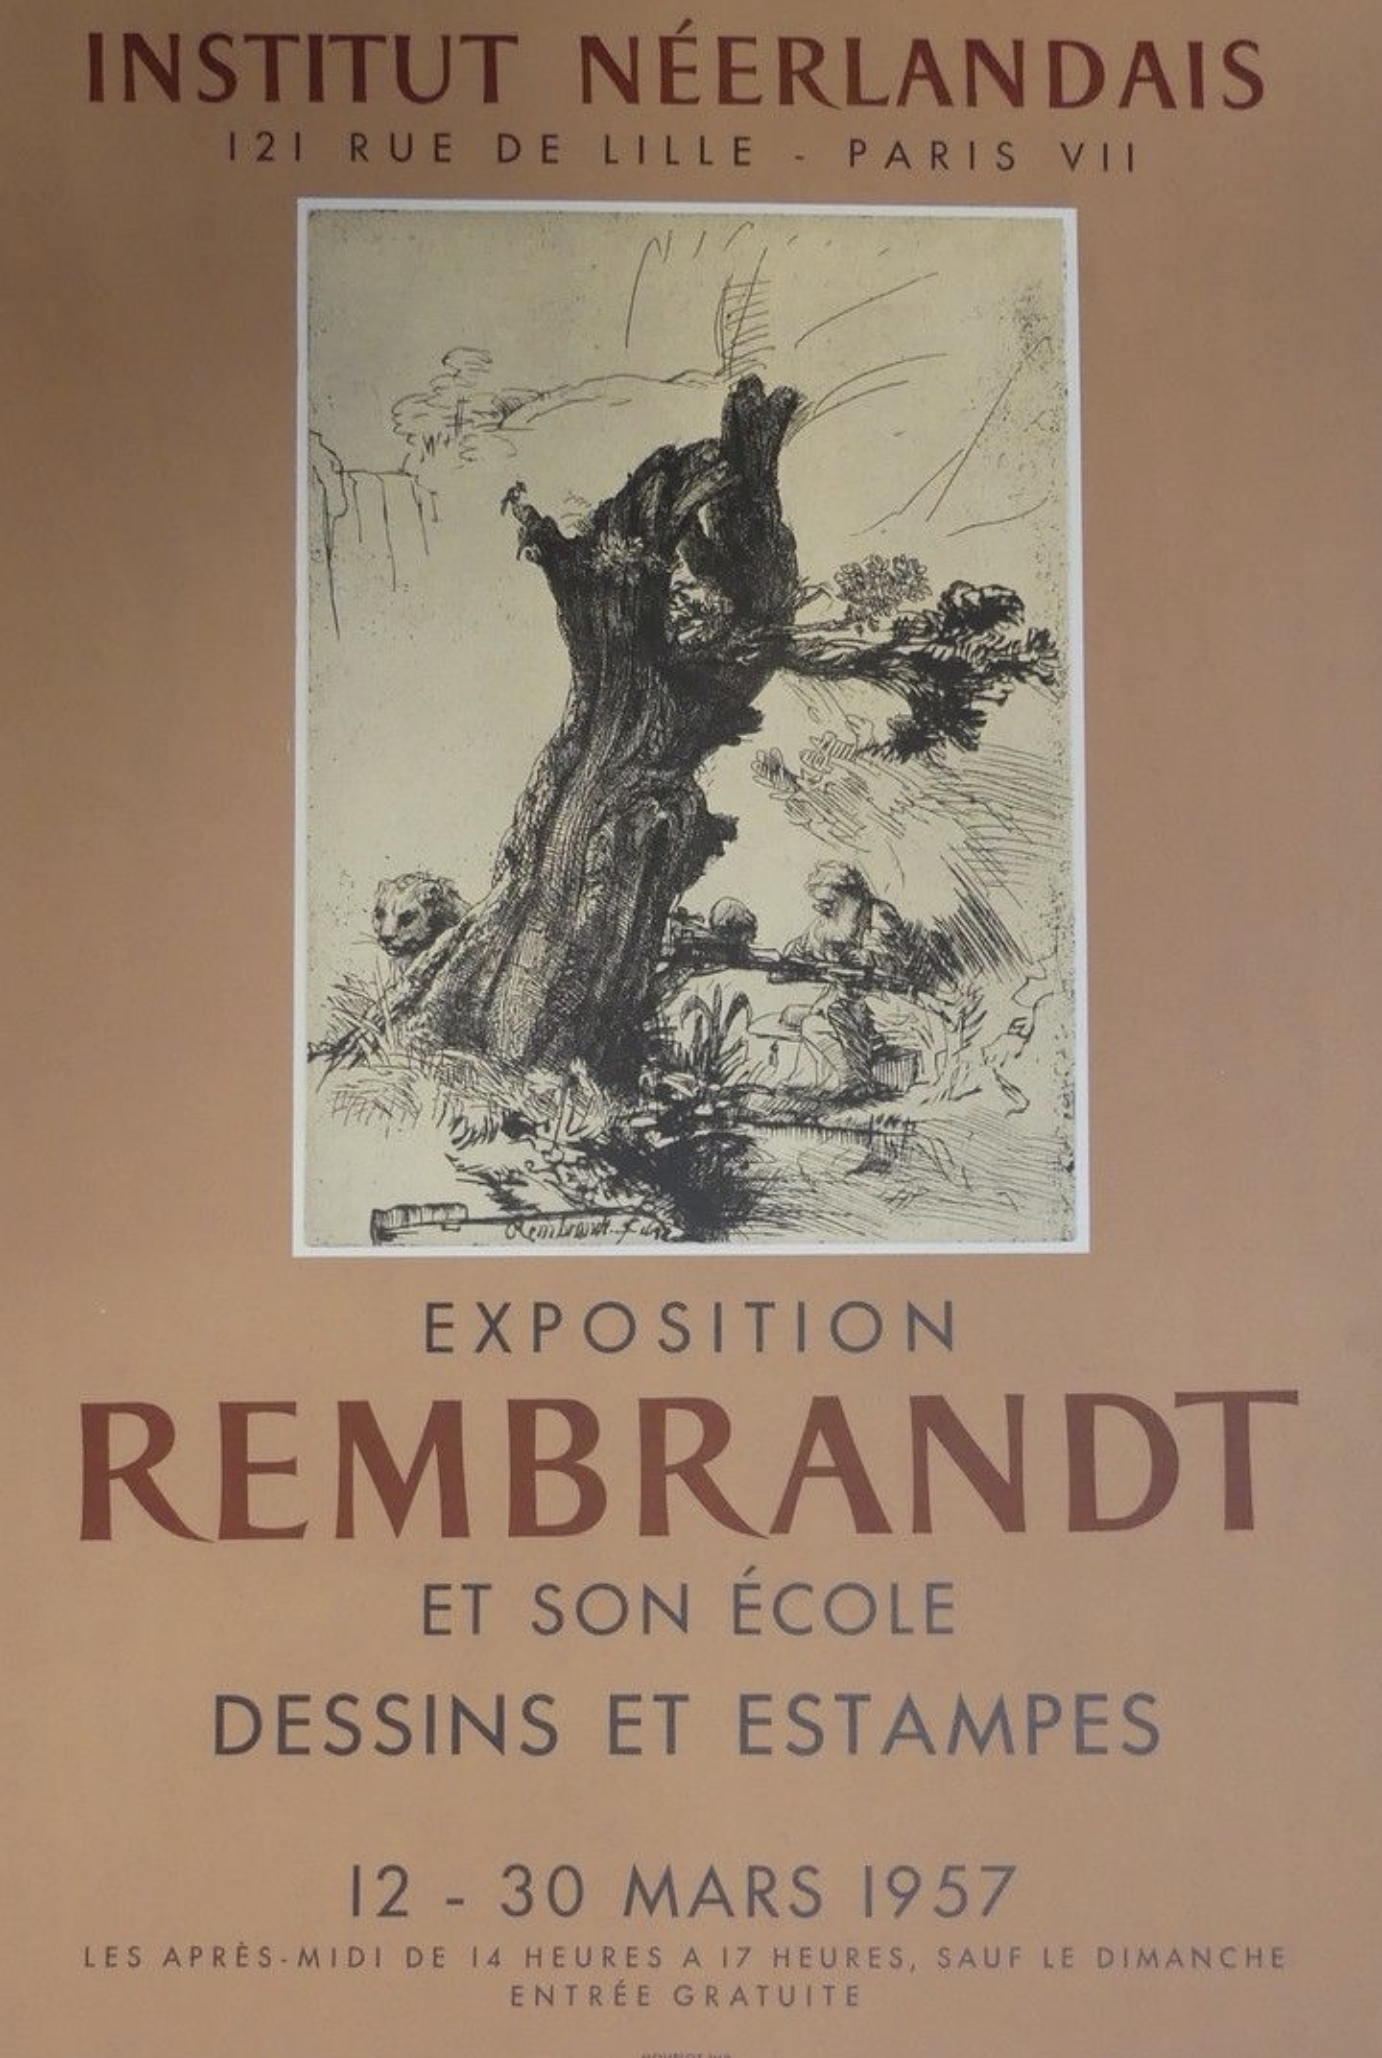 Exposition Rembrandt Original Vintage Poster Letitia Morris Gallery